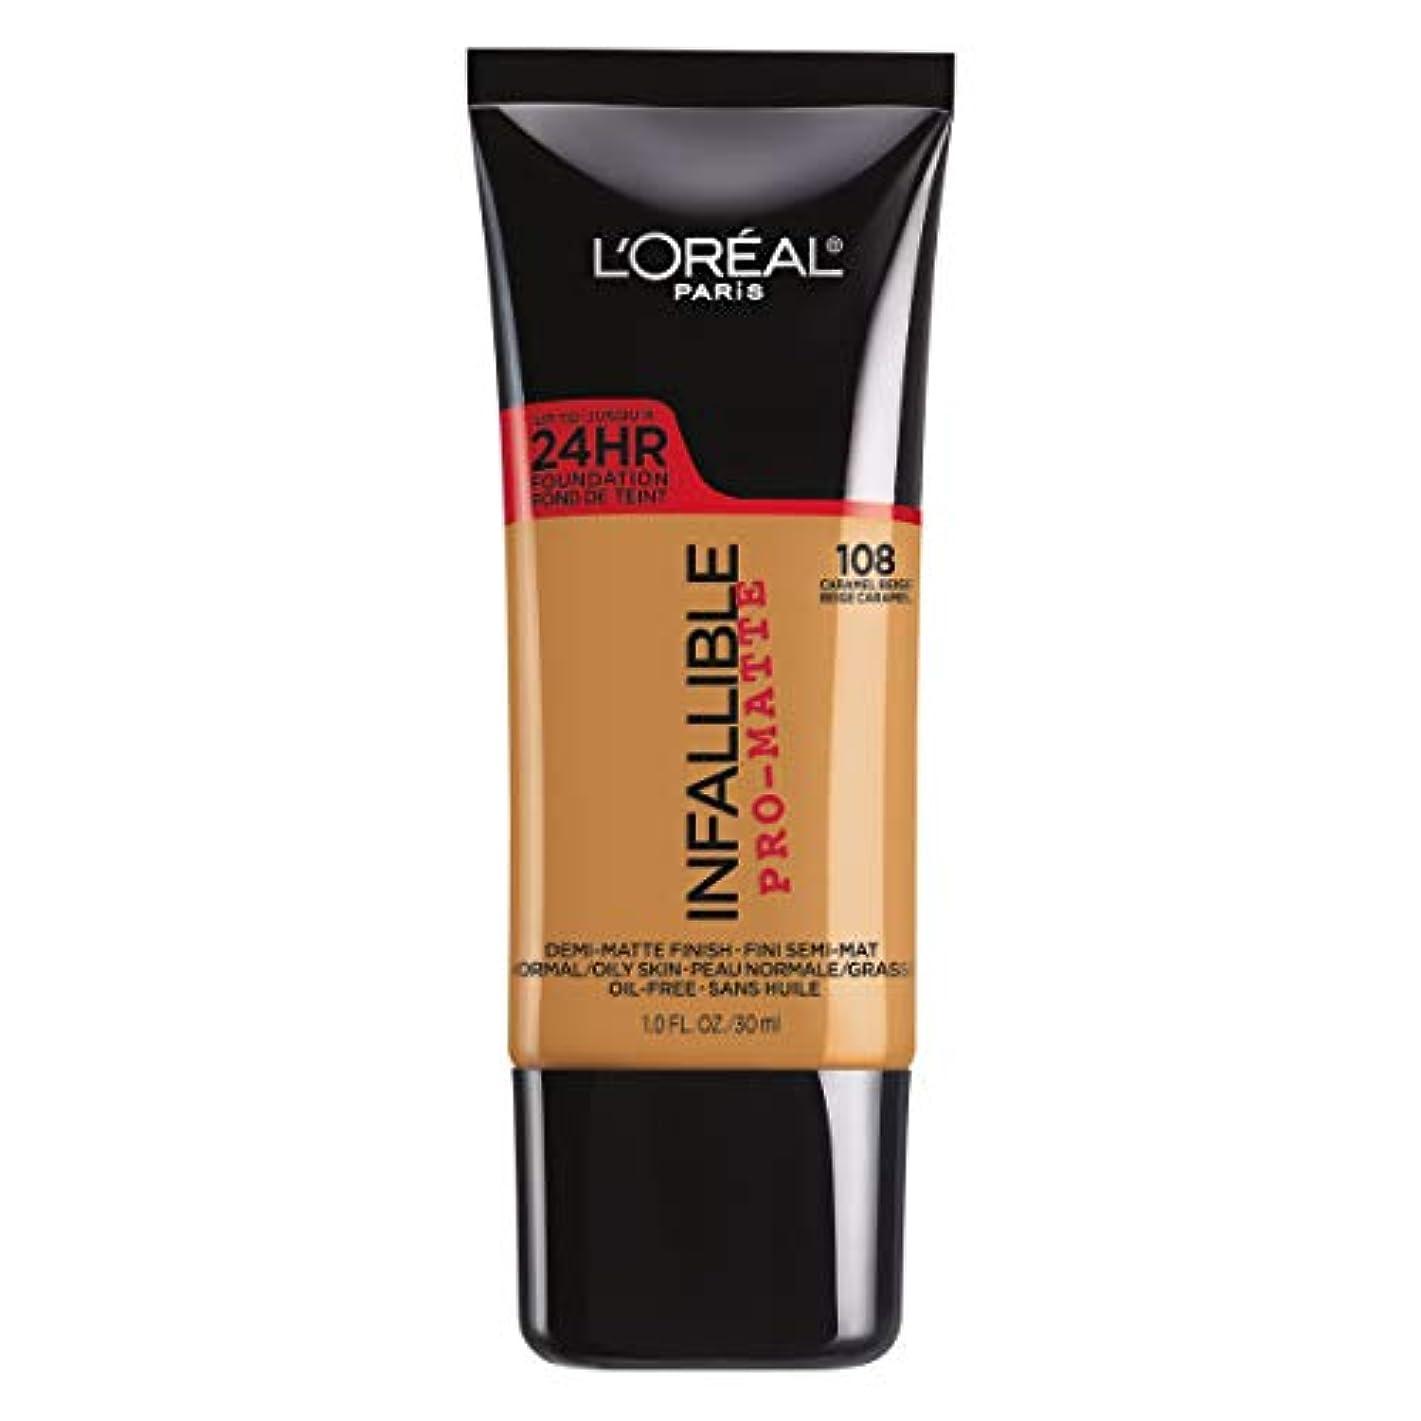 病院変更着服L'Oreal Paris Infallible Pro-Matte Foundation Makeup, 108 Caramel Beige, 1 fl. oz[並行輸入品]